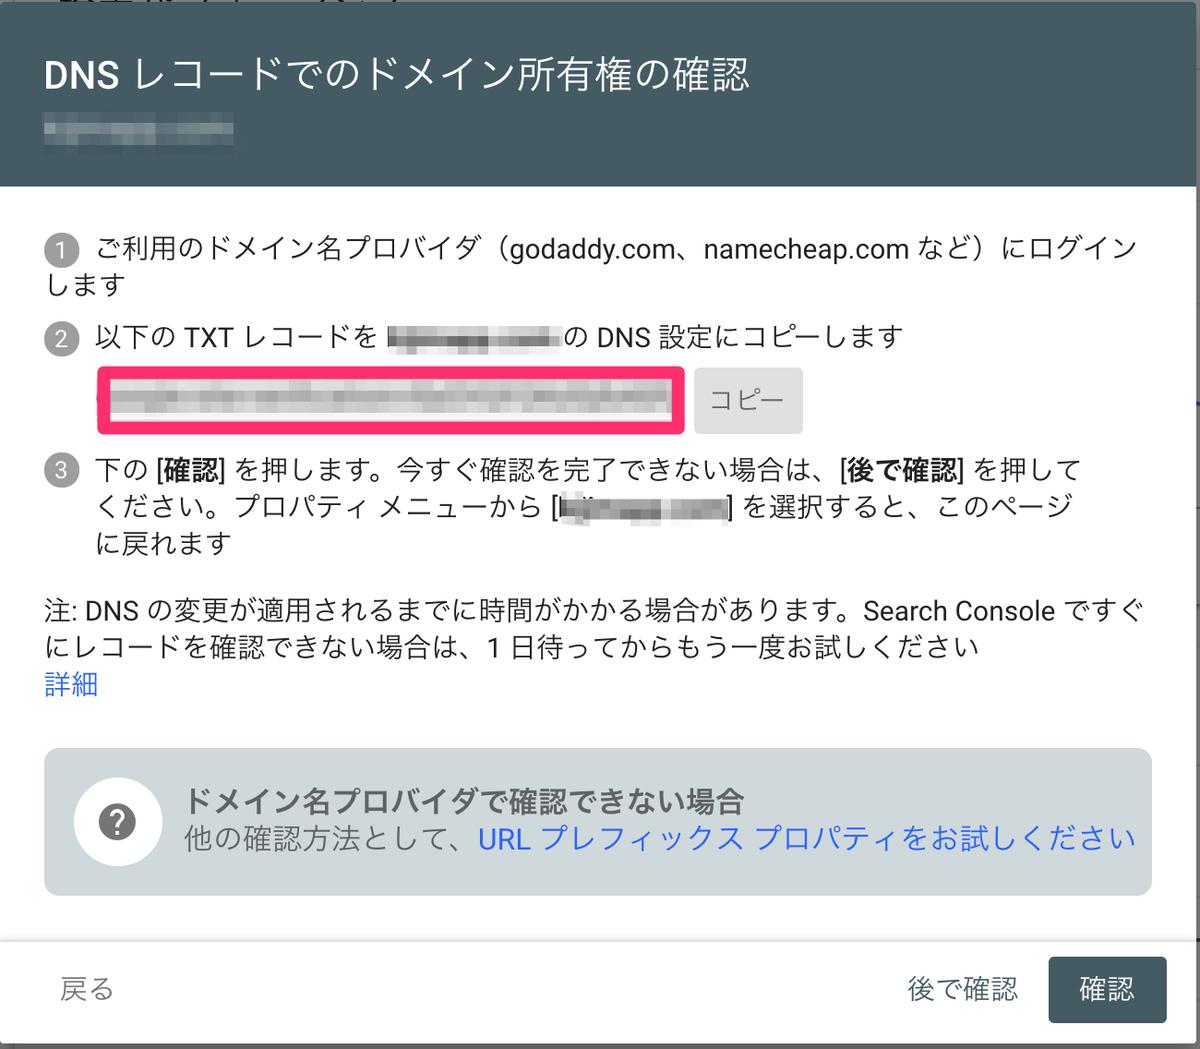 1. Search Consoleでサイトのドメインを入力